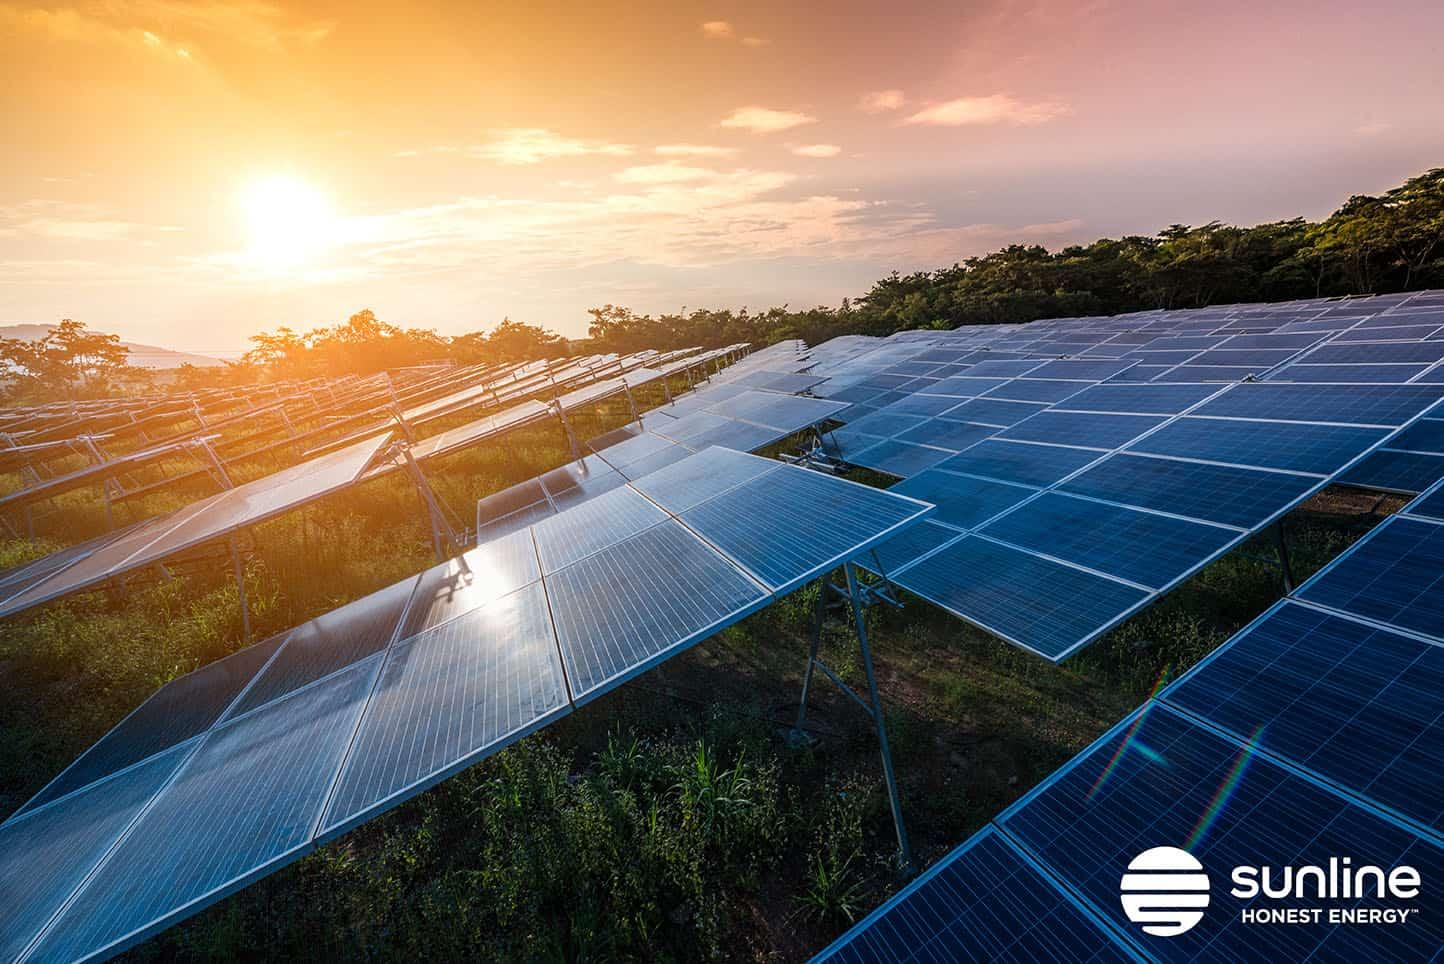 Installing Solar in Public Lands Blog by Sunline Energy